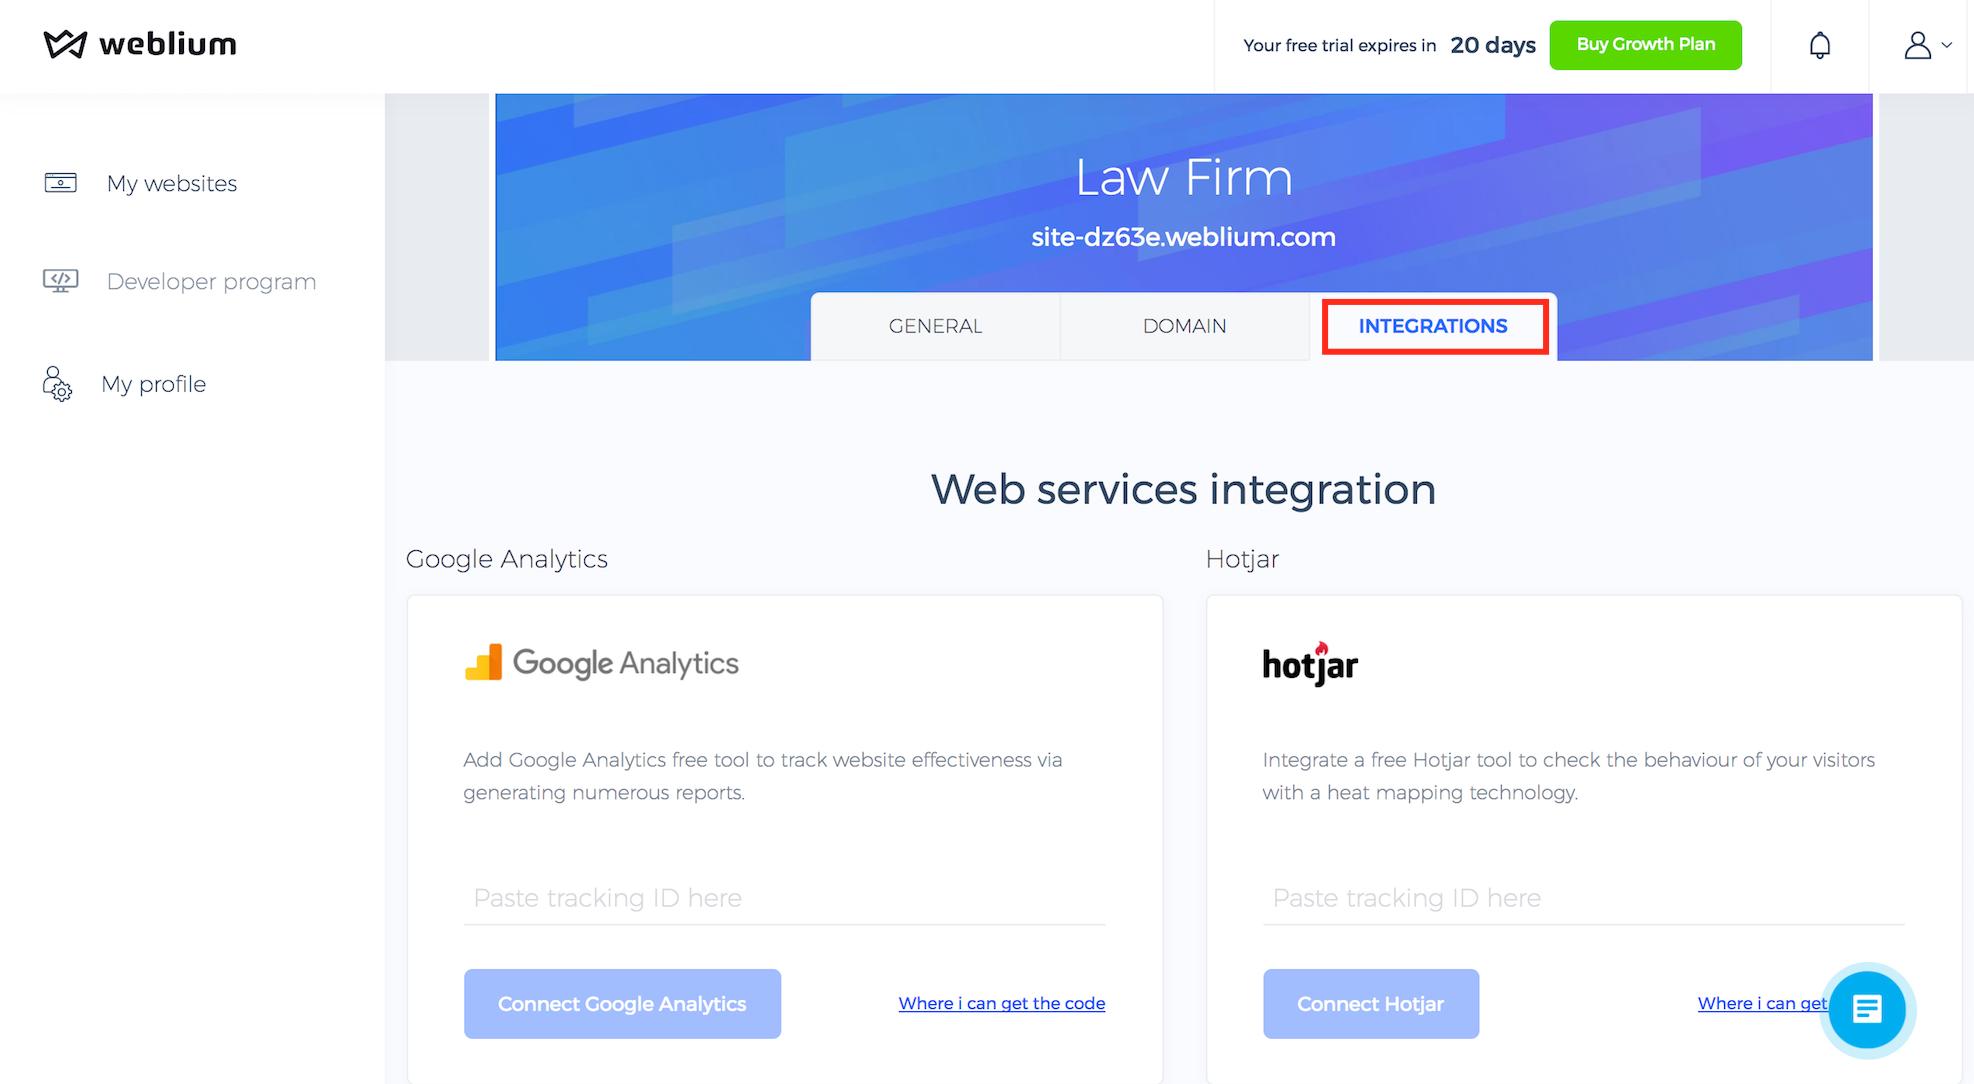 Integrations on Weblium